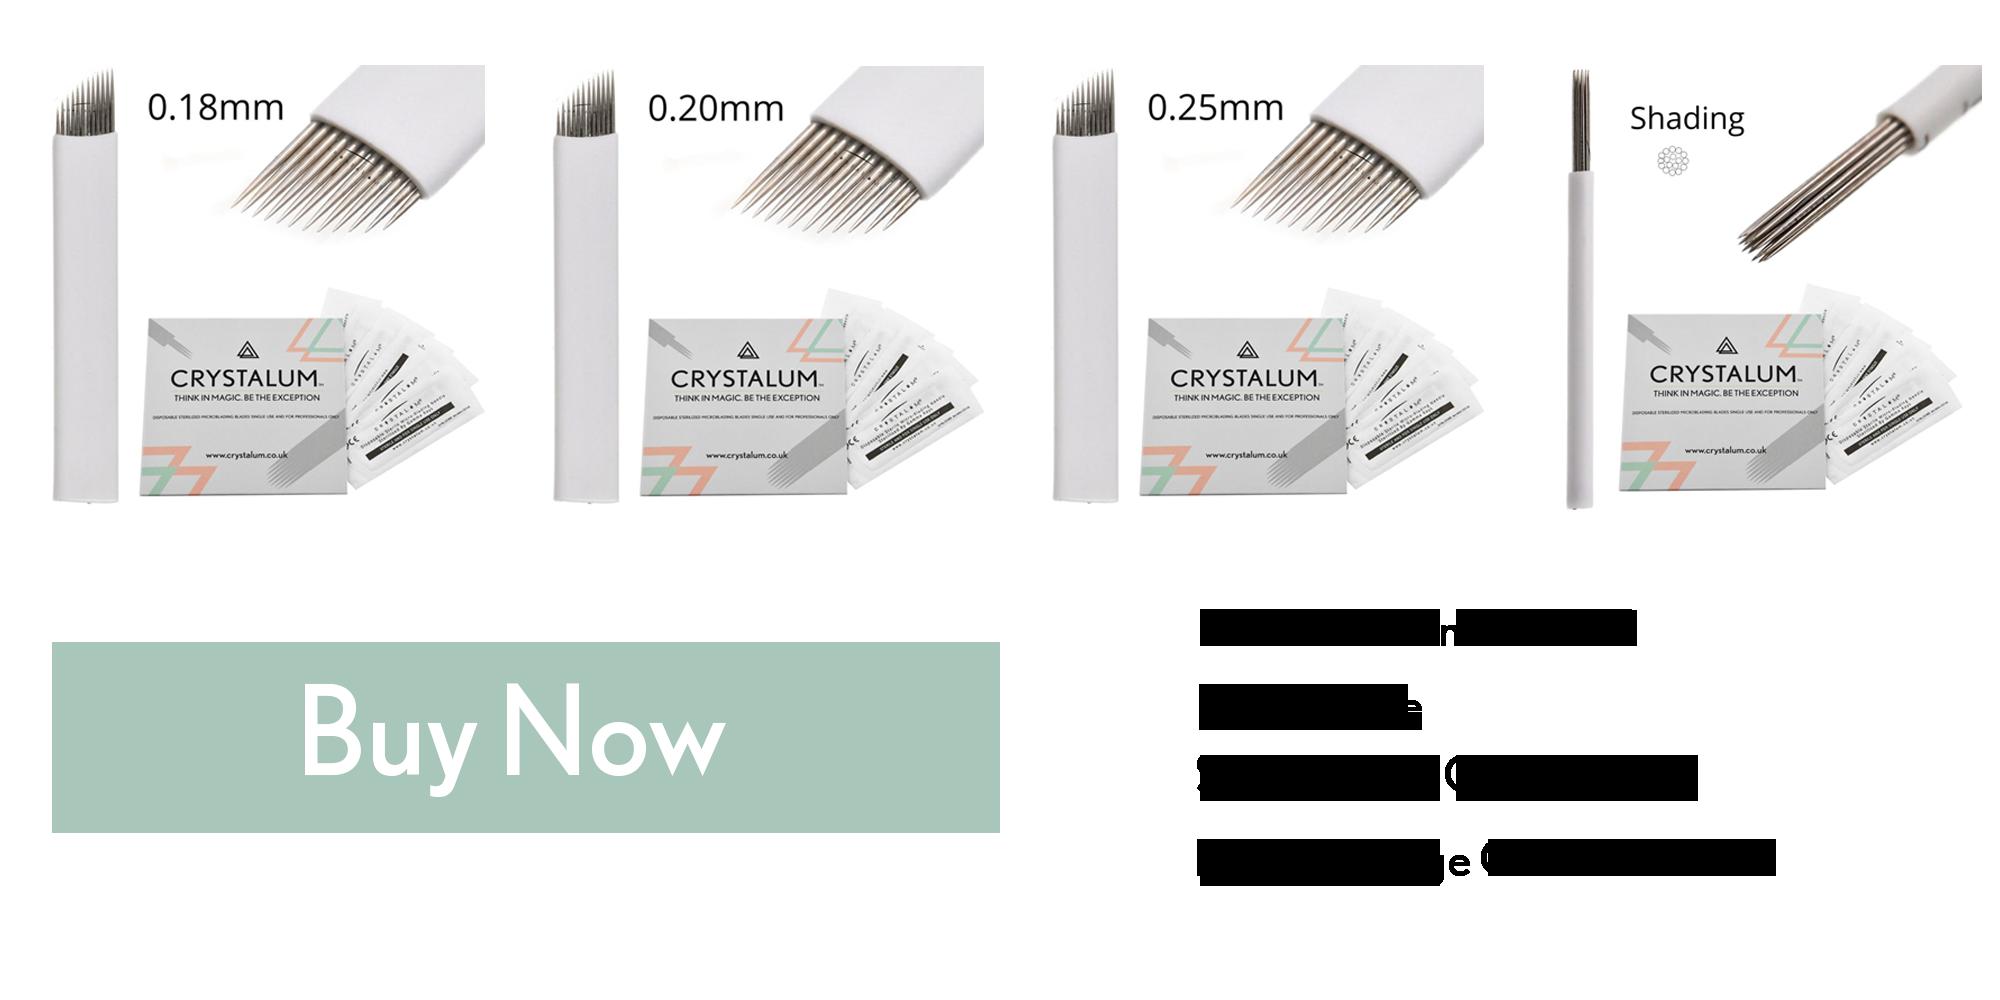 crystalum microblading blades